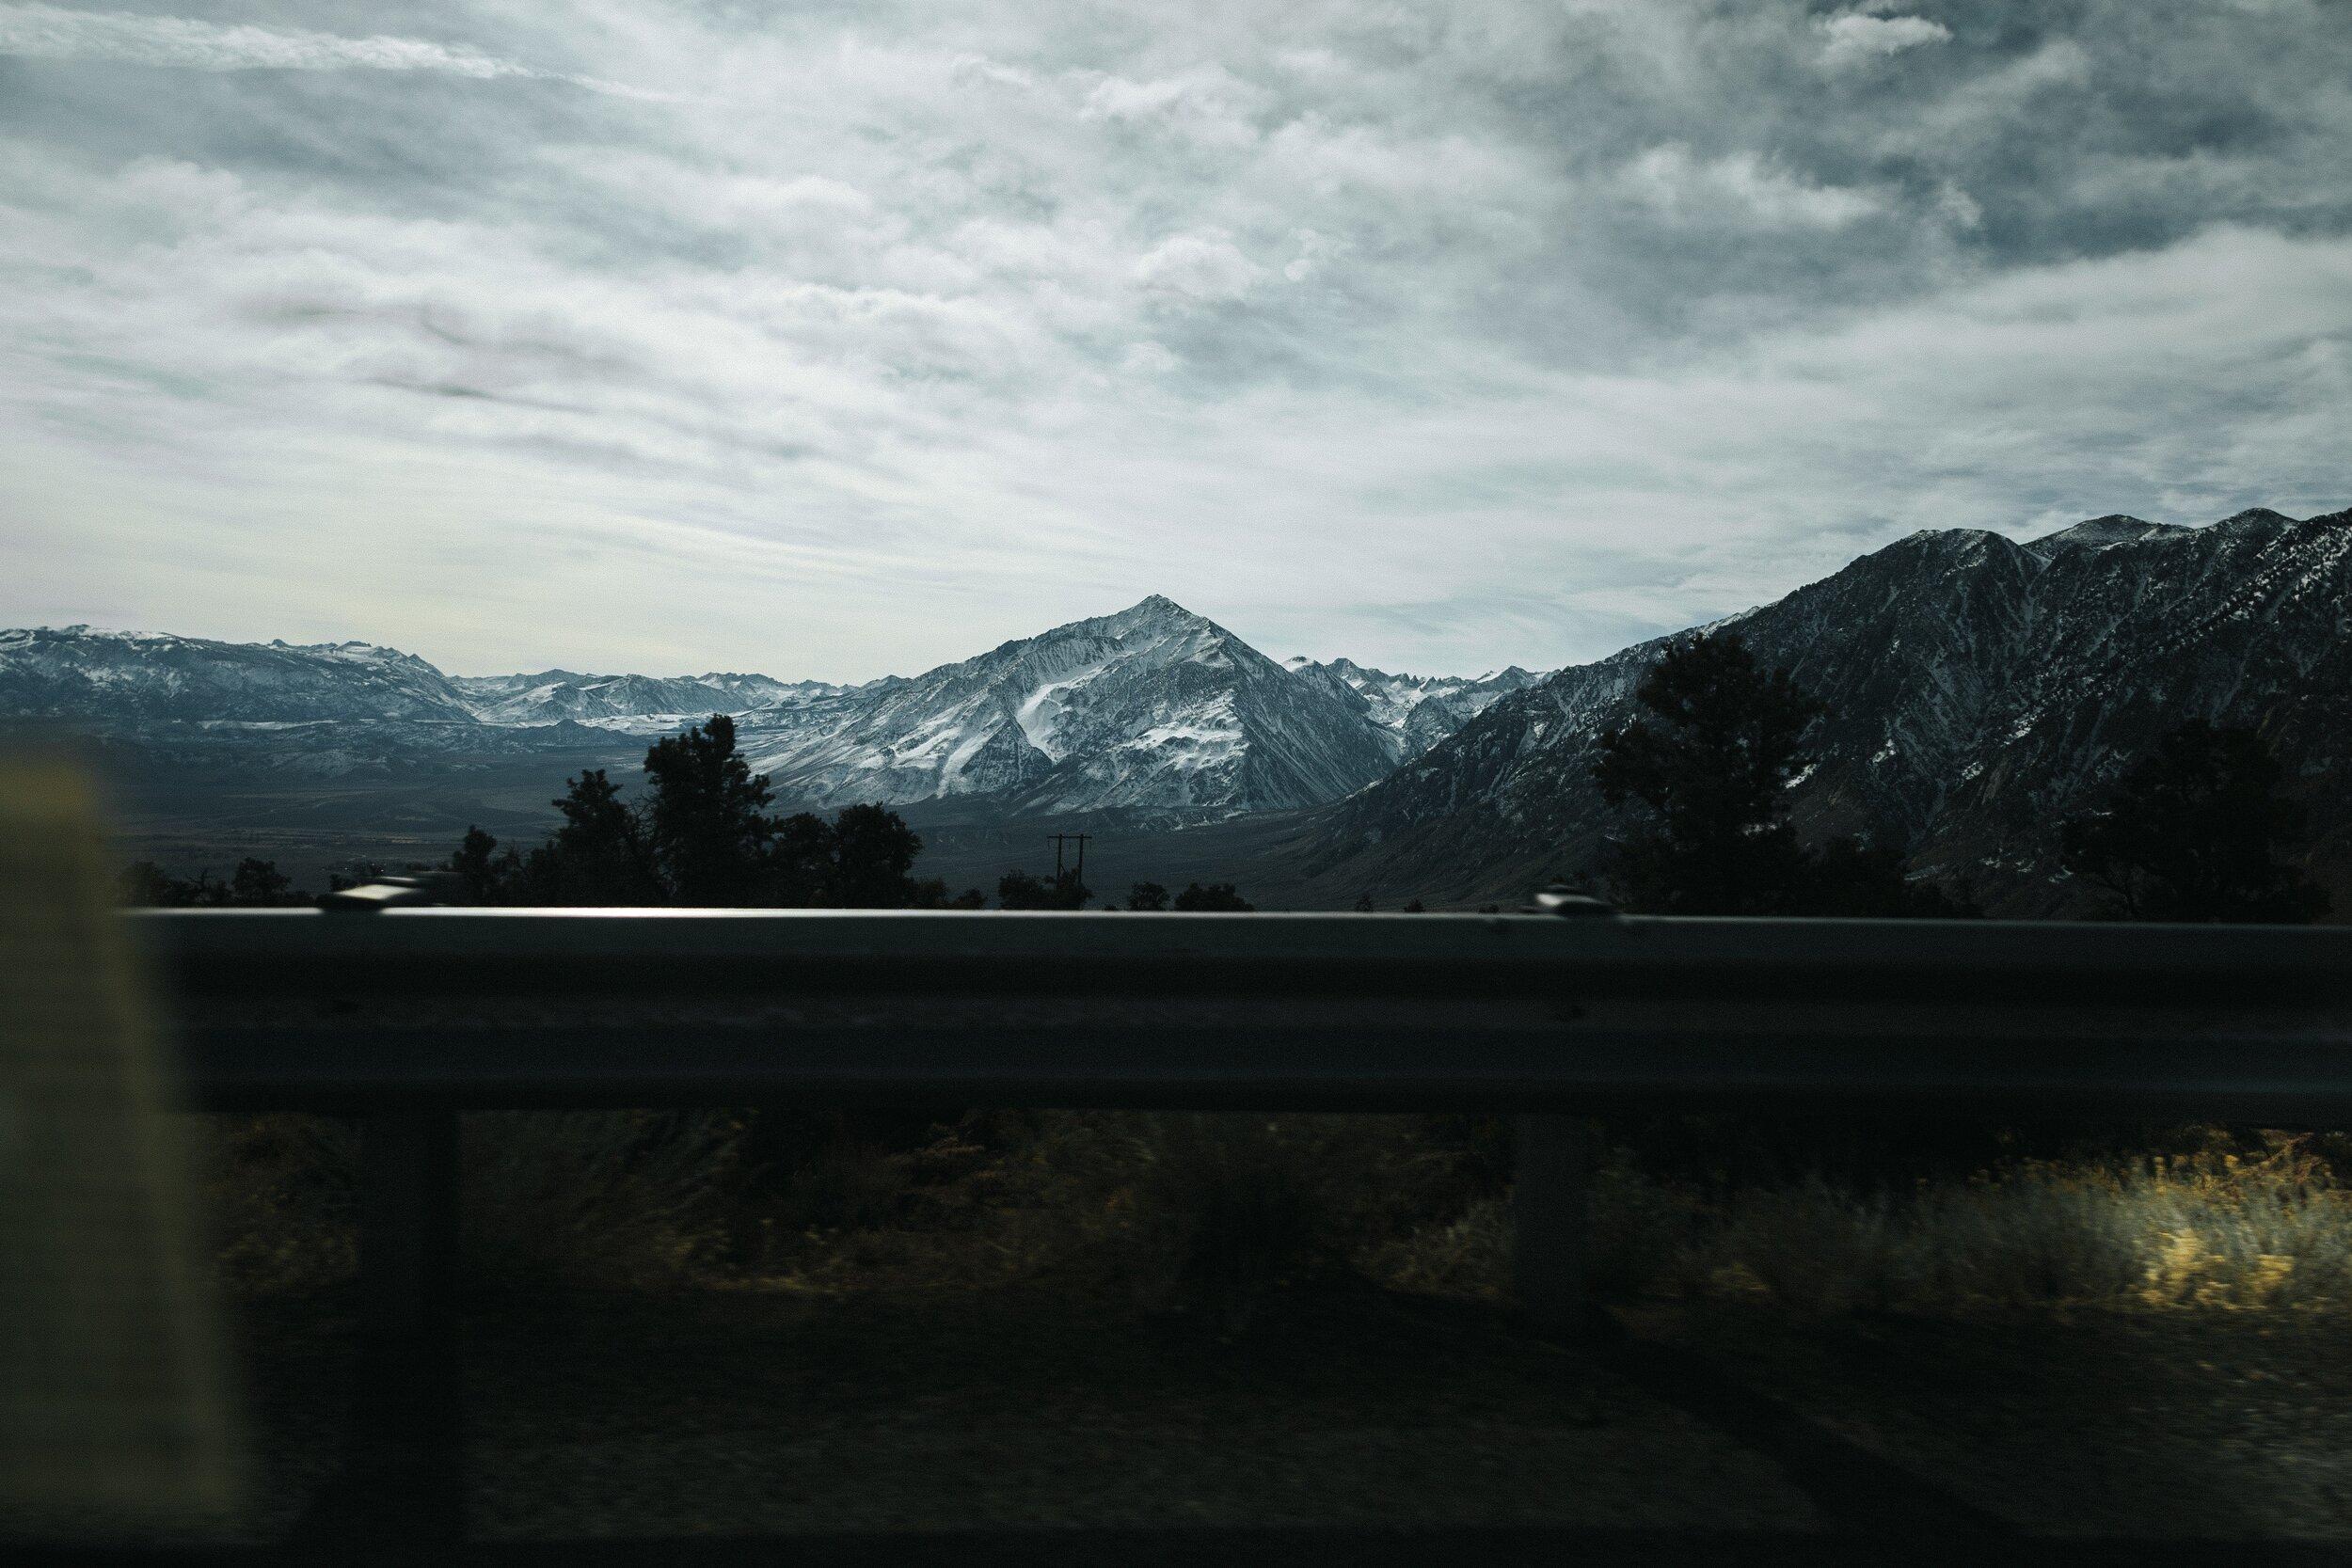 Hike up Mammoth Mountain